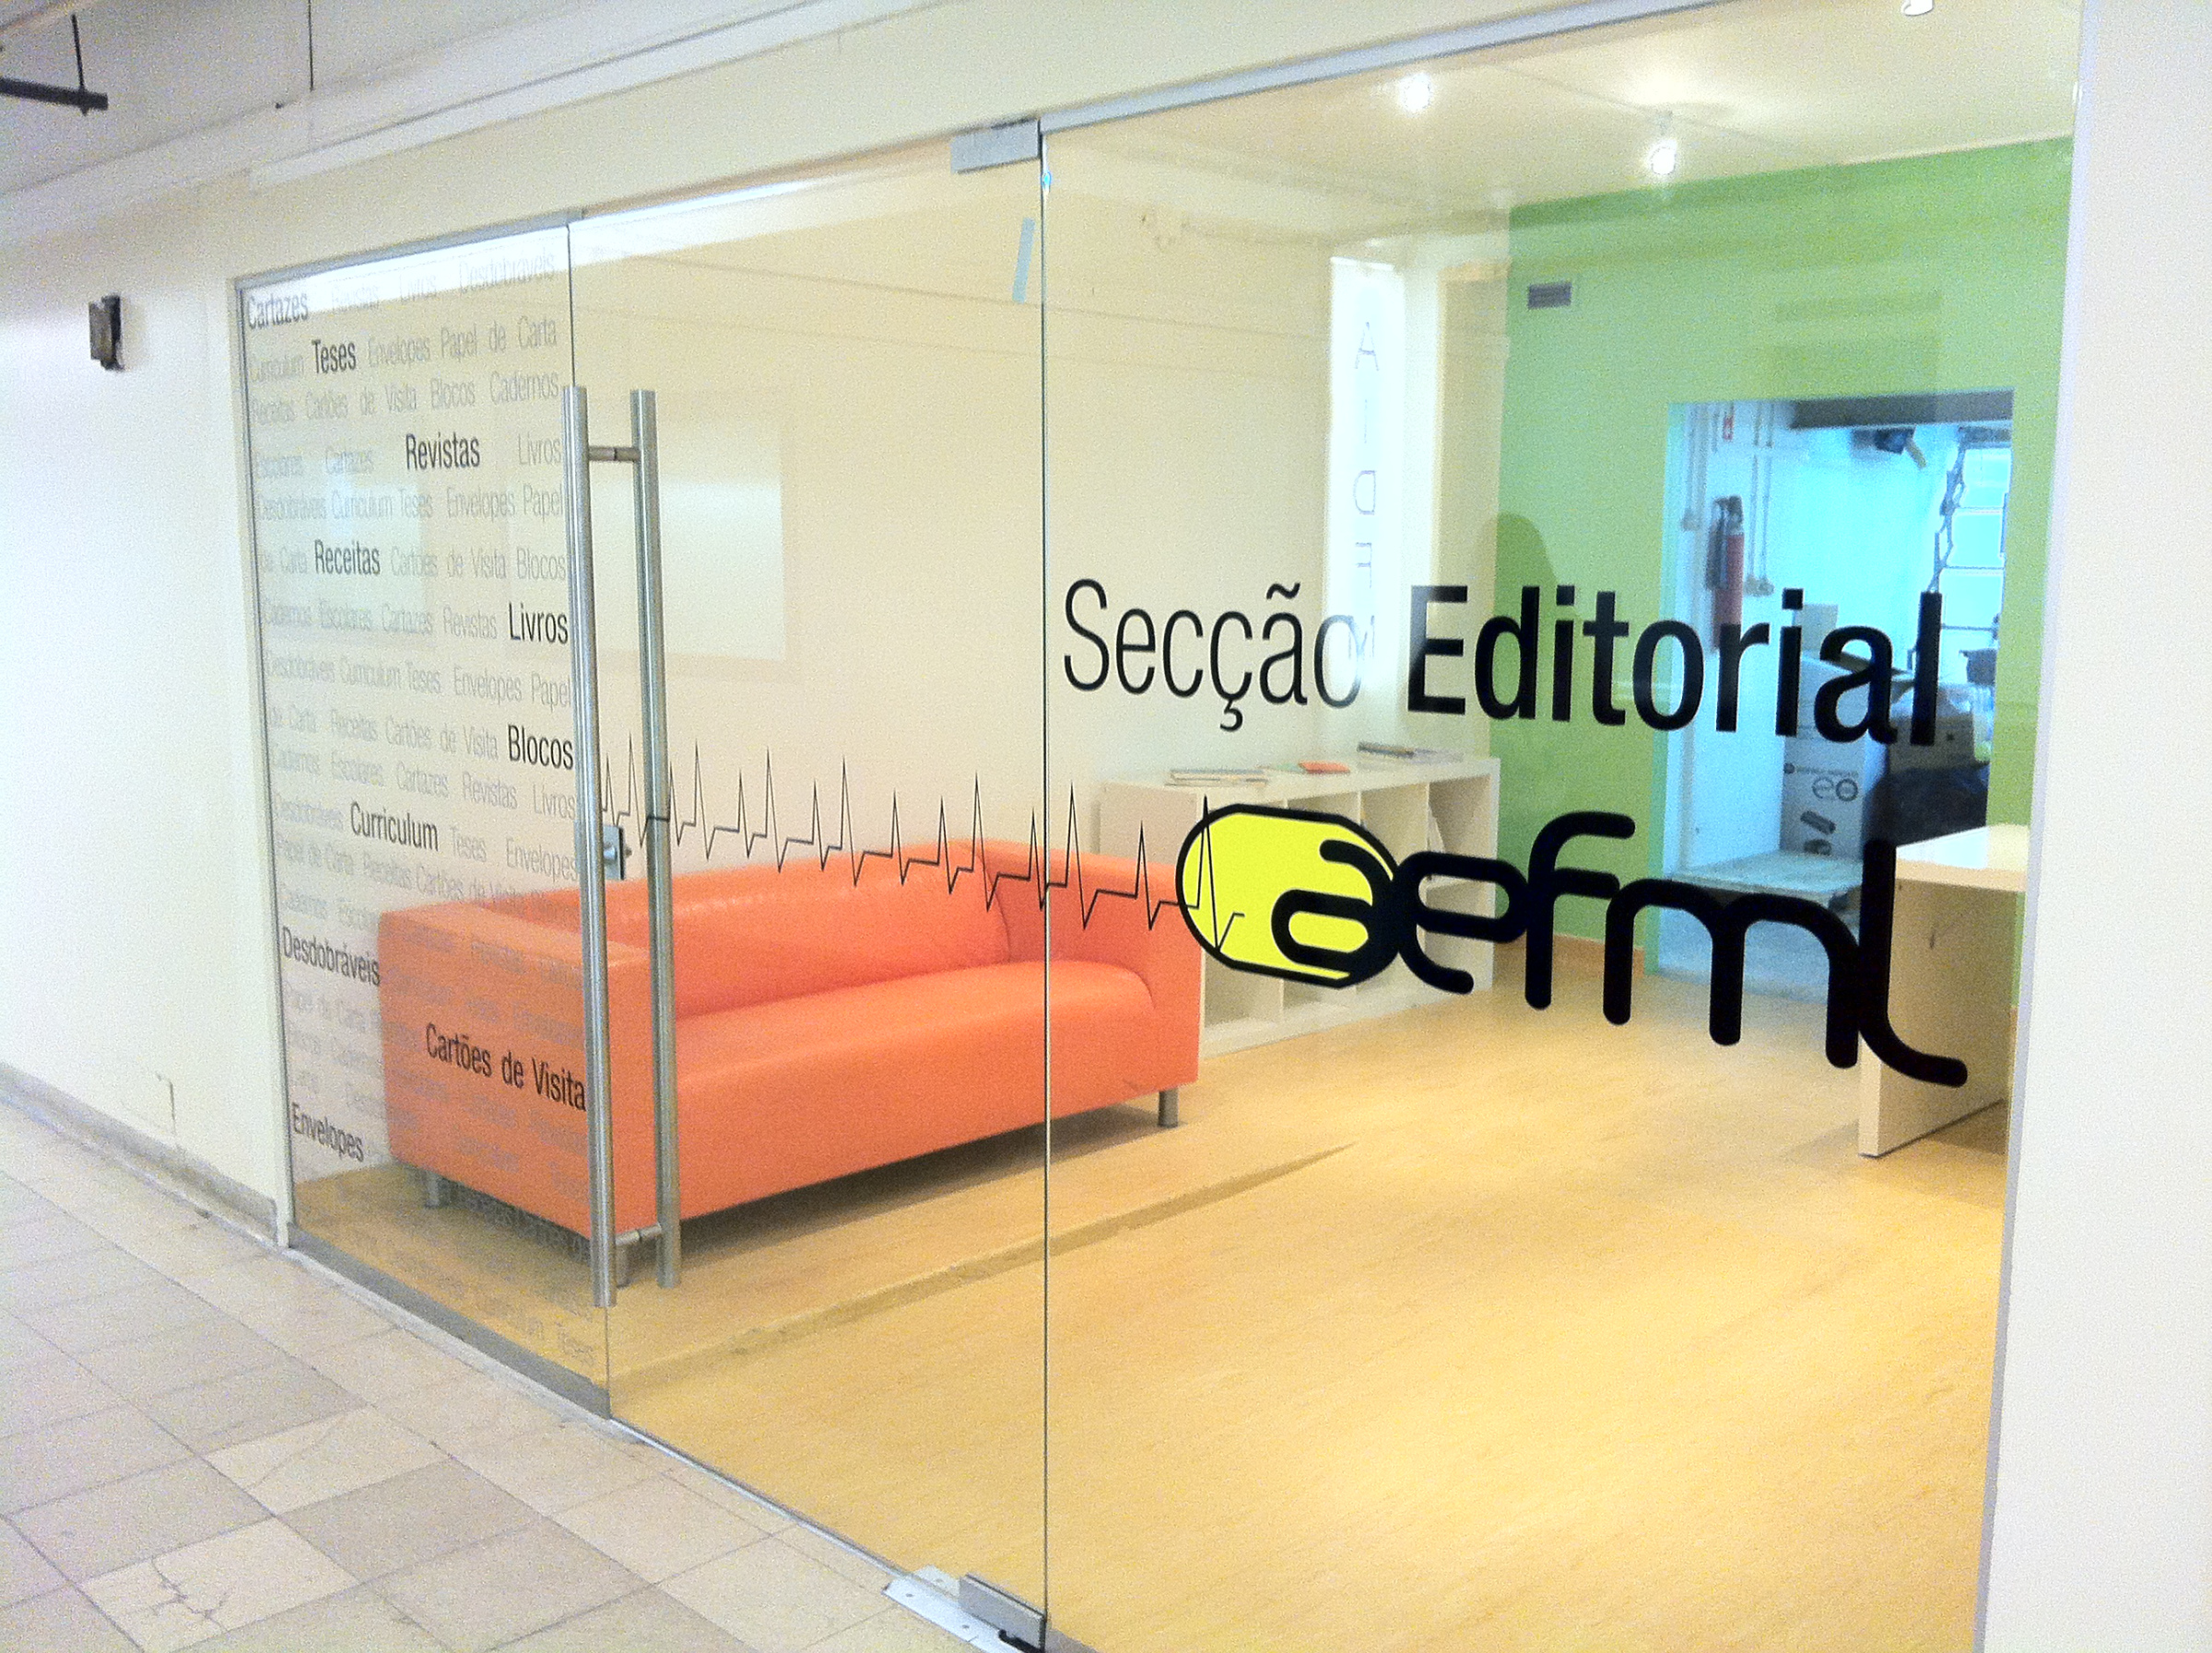 28-05-secc3a7c3a3o-editorial-aefml-2012.jpg